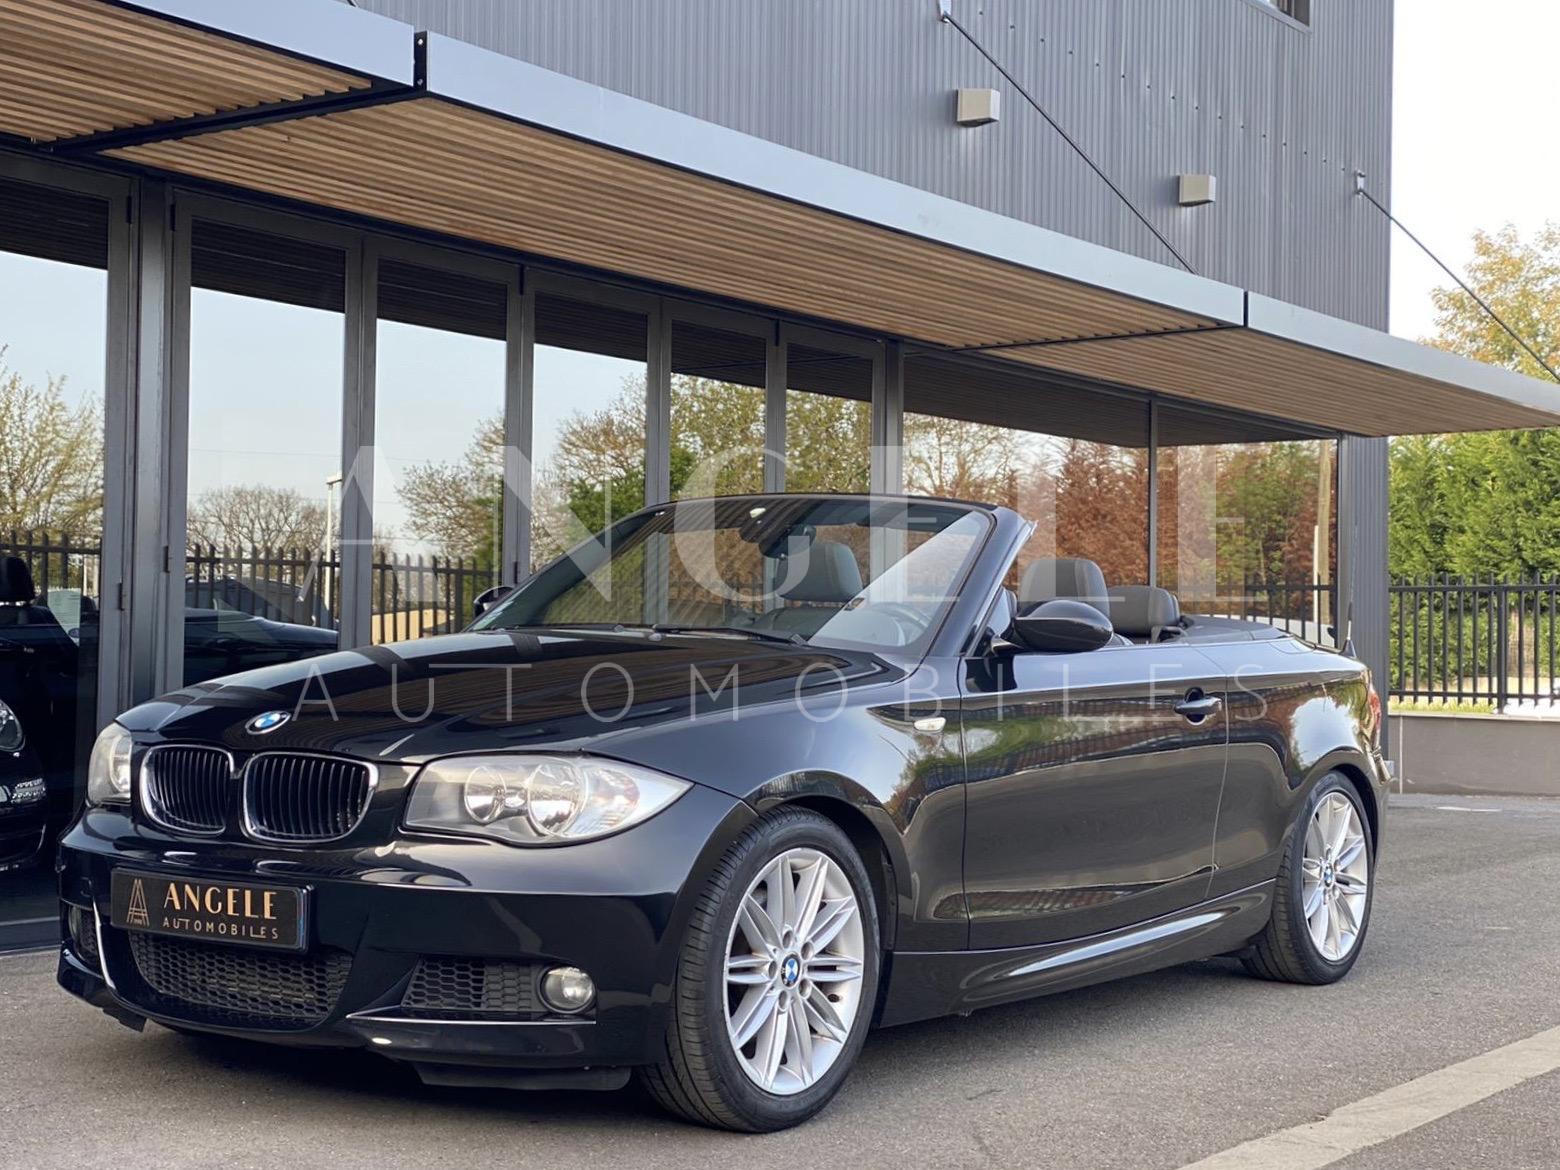 BMW 120 D - Angelé Automobiles